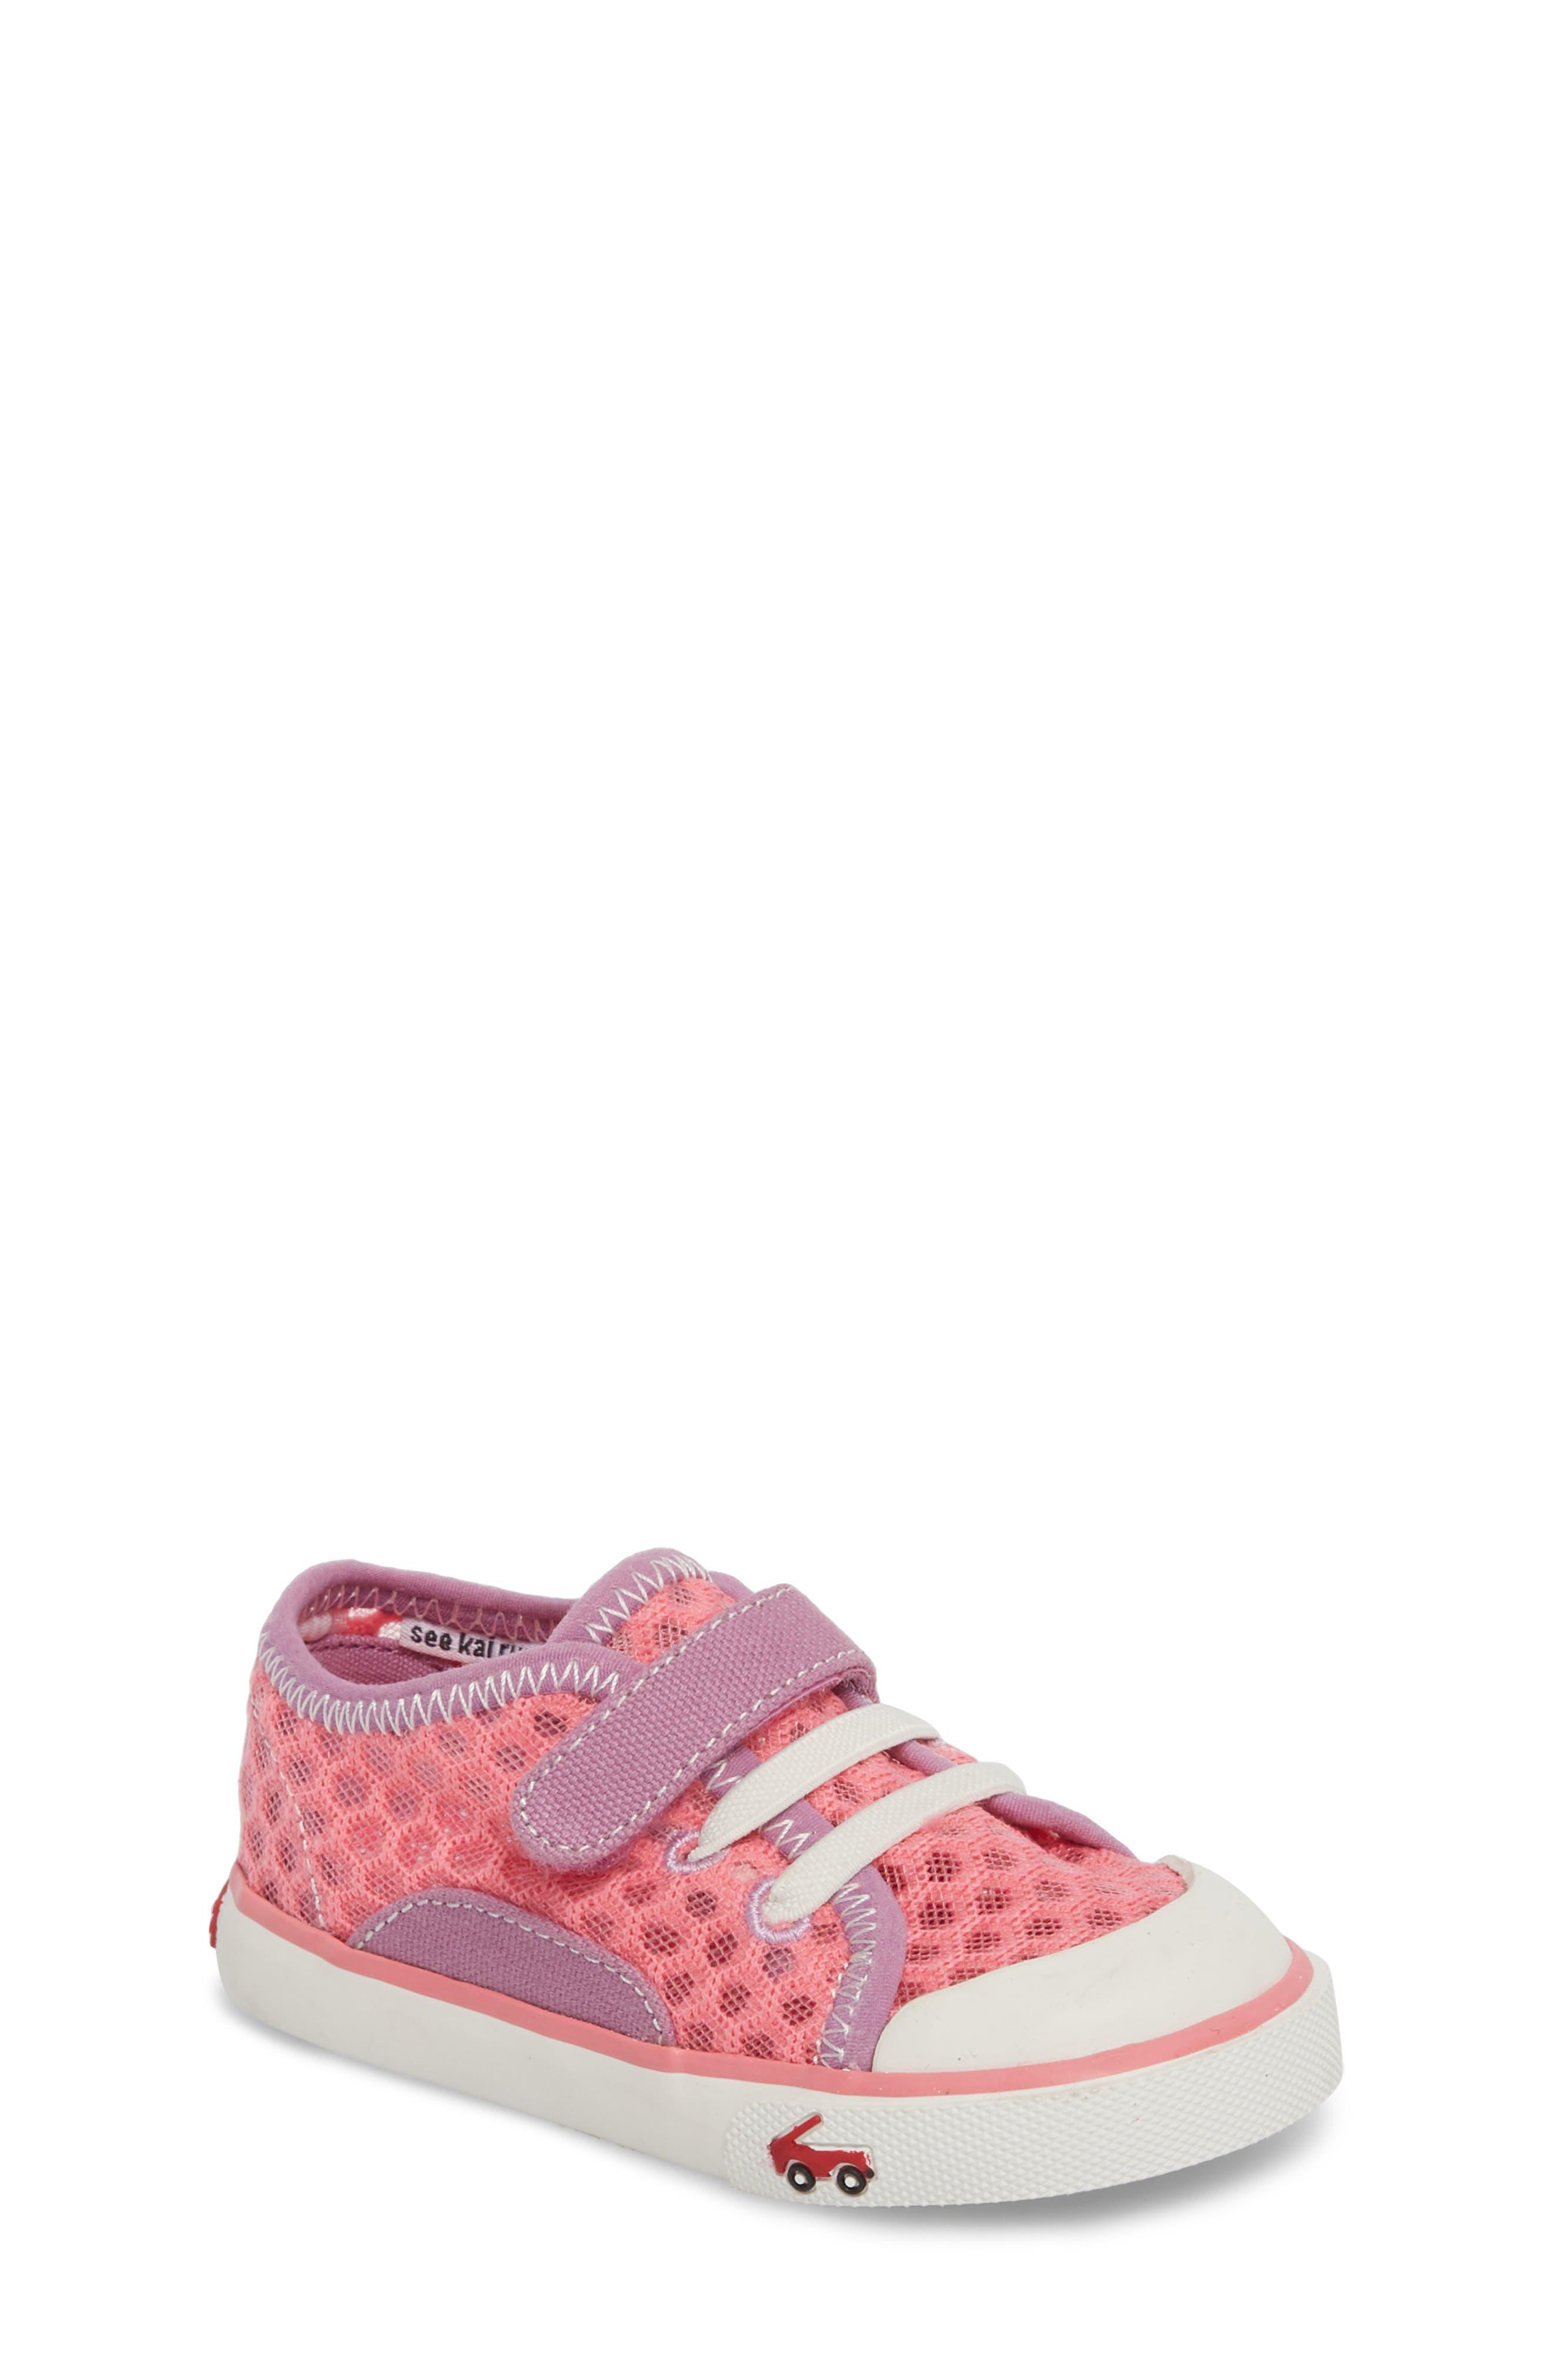 See Kai Run Saylor Sneaker (Baby, Walker, & Toddler)